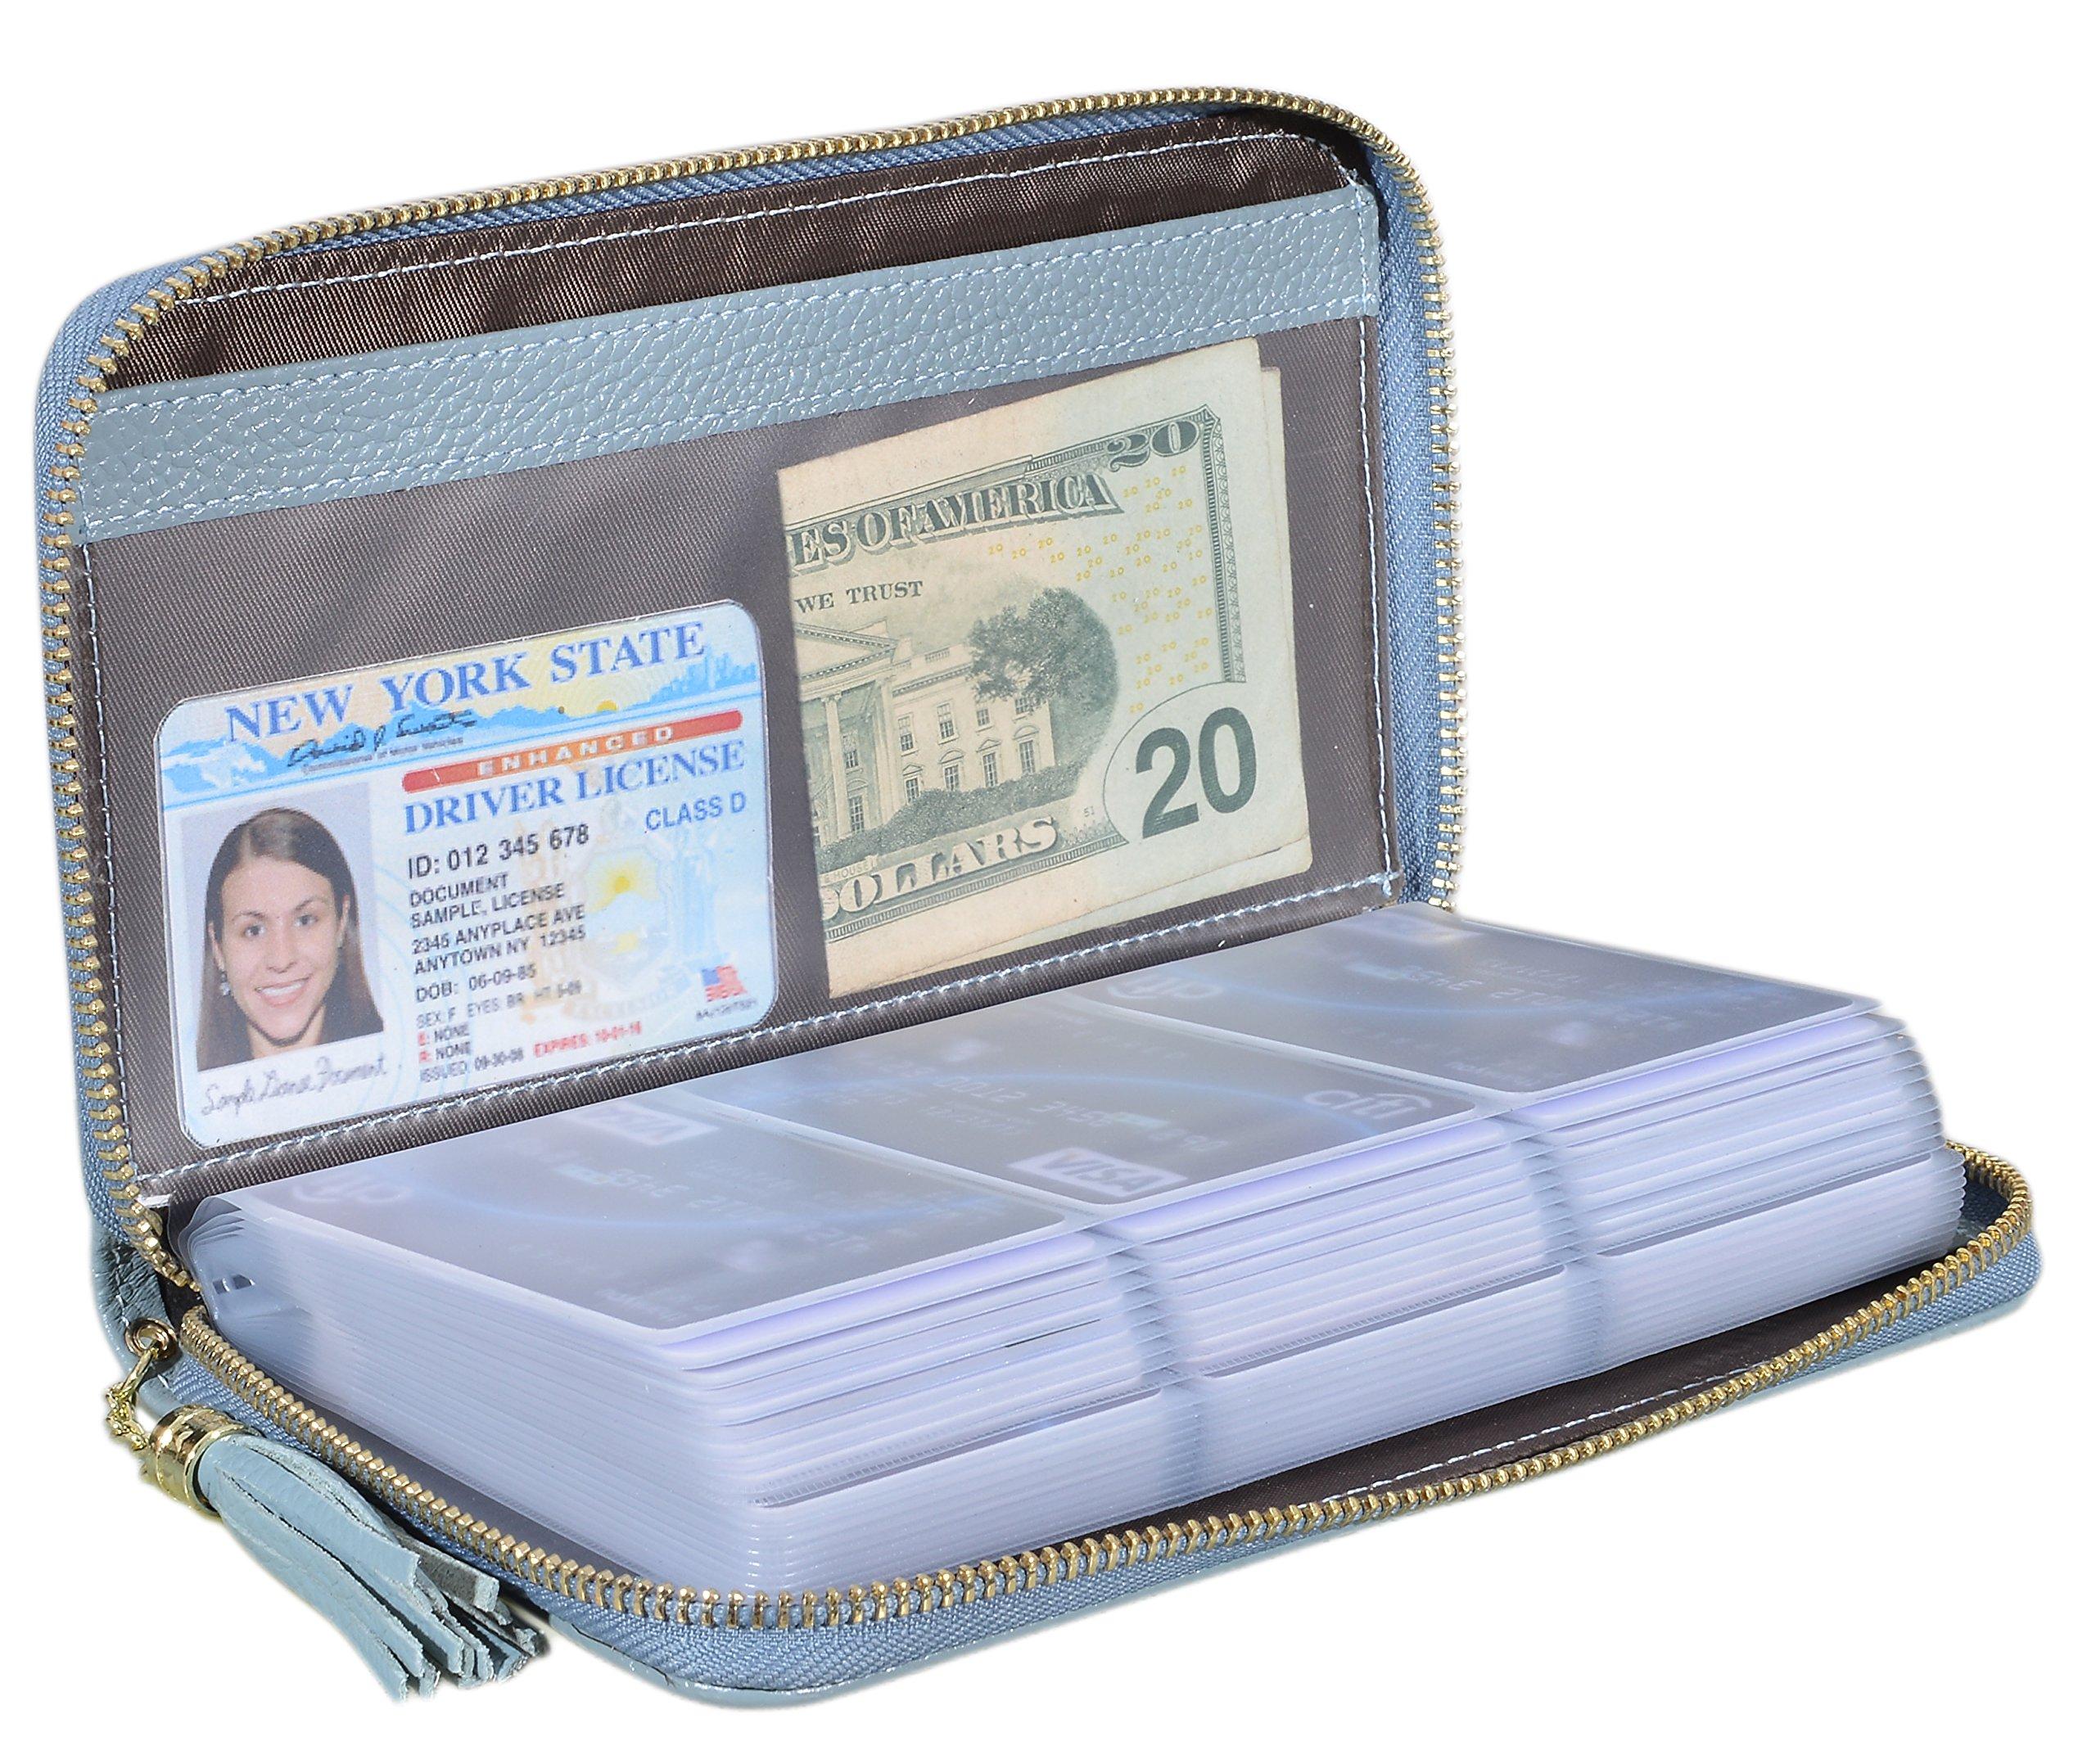 Easyoulife Credit Card Holder Wallet Womens Zipper Leather Case Purse RFID Blocking (Light Blue)